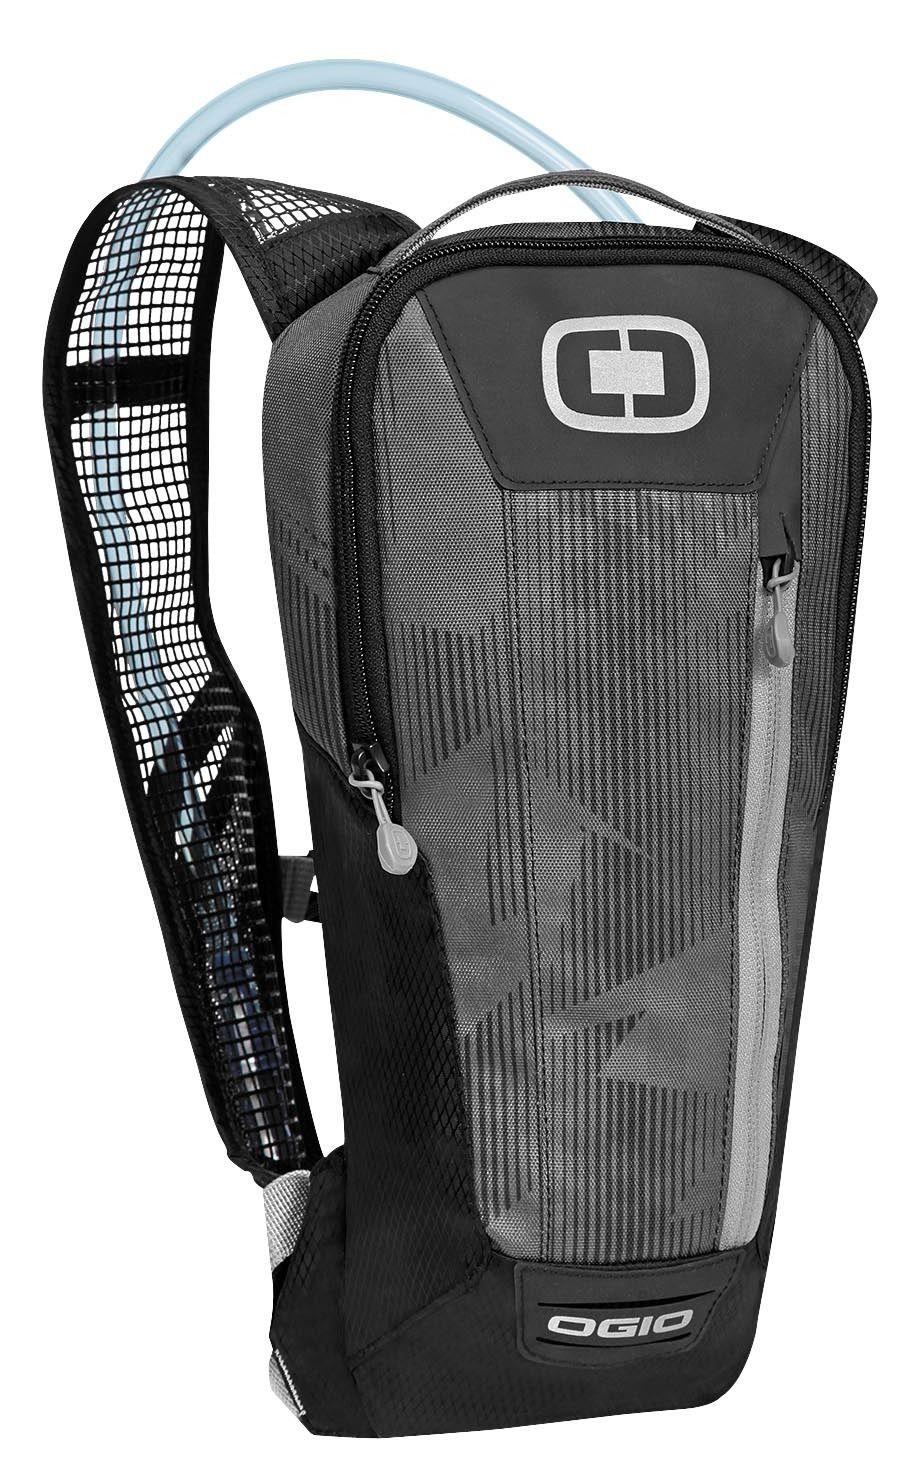 Ogio Hydration Backpack | Crazy Backpacks